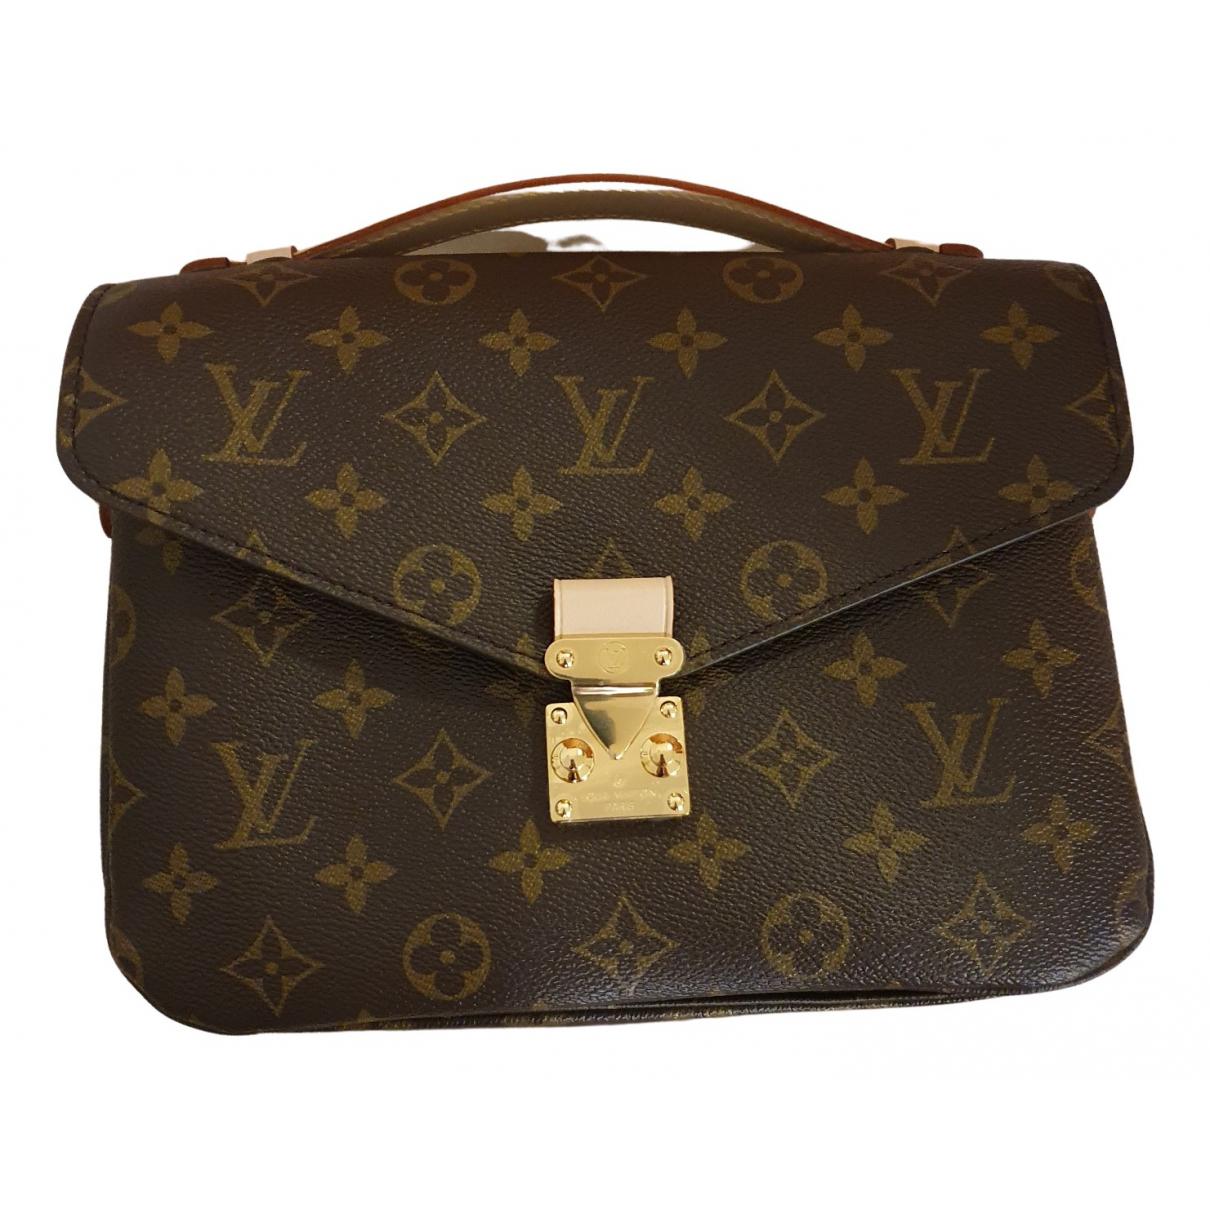 Louis Vuitton - Sac a main Metis pour femme - marron